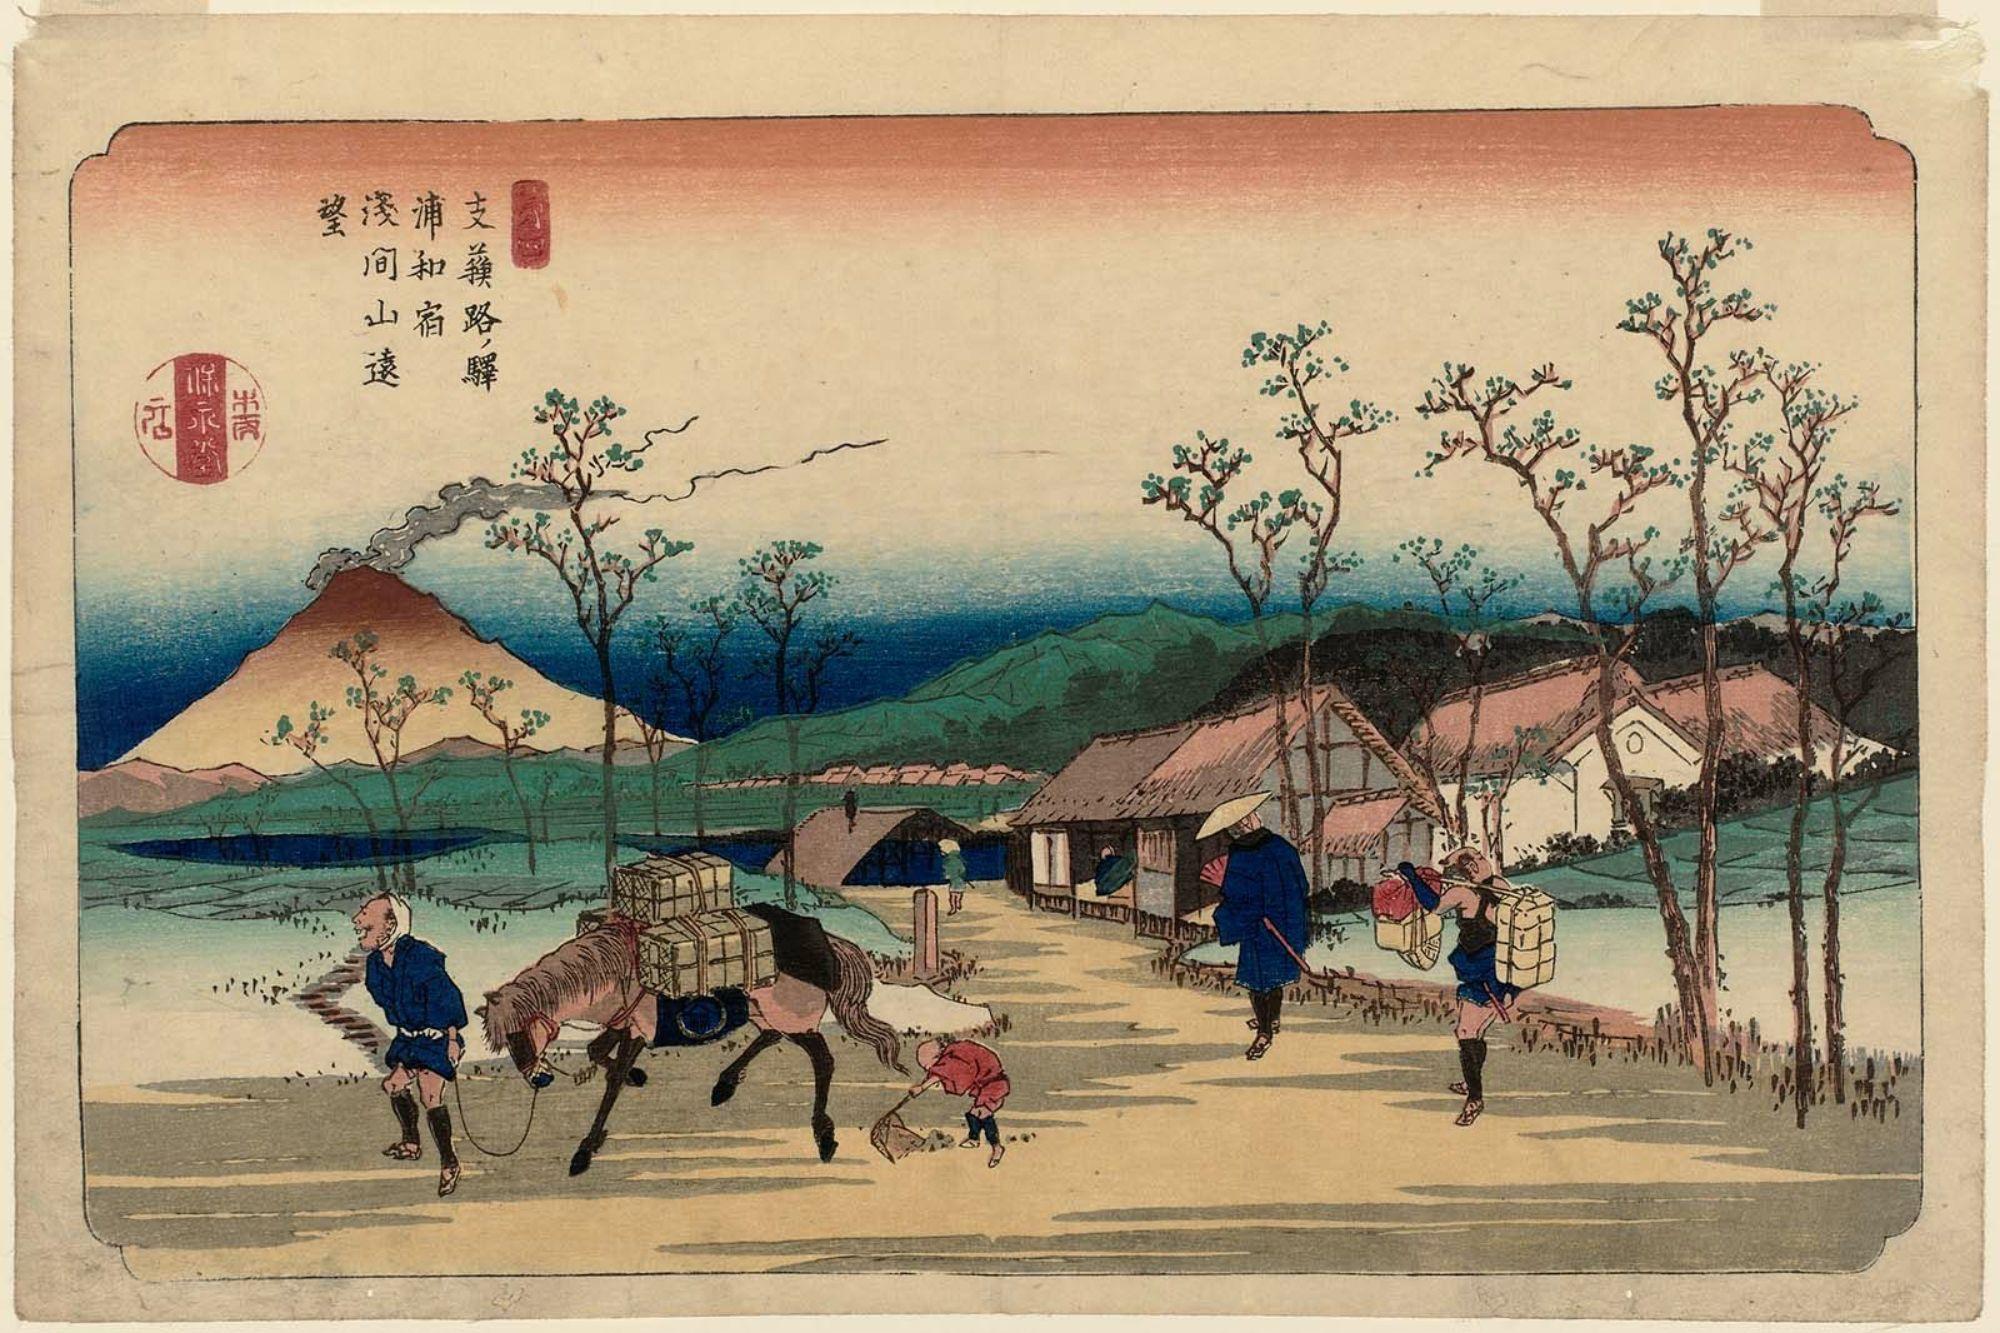 https://data.ukiyo-e.org/mfa/images/sc129321.jpg